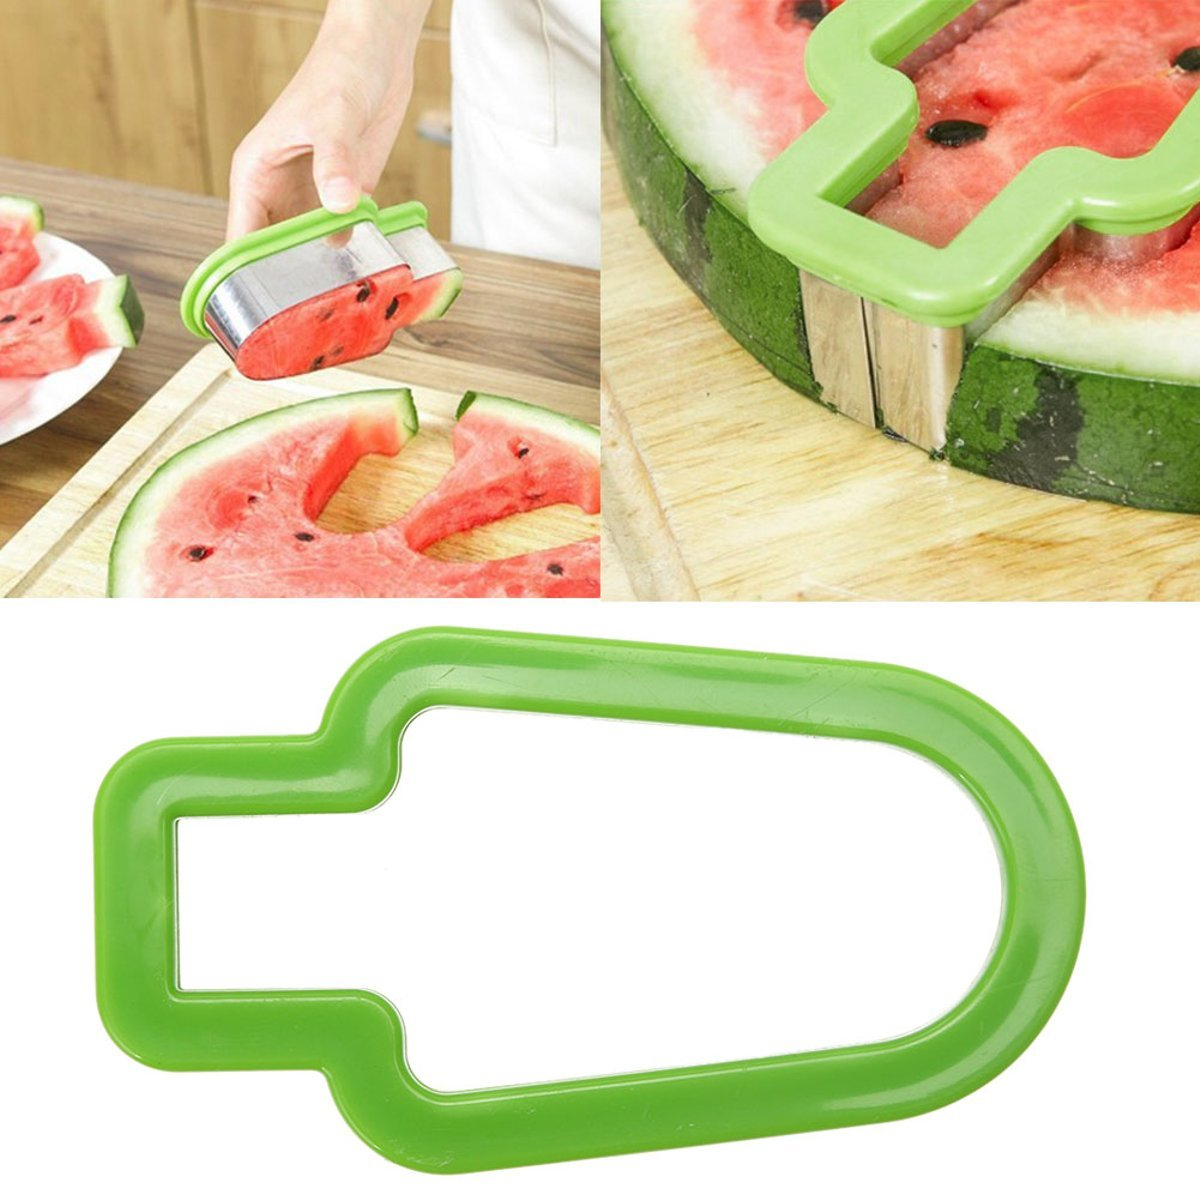 VANLLERTEAM – 1PCS Watermelon Slicer. Knife Ice Cream Shape Fruit Cutter Slicer. Watermelon Slice Model Fruit Knife Ice Cream Shape Fruit Cutter Slicer Cooking Tool.